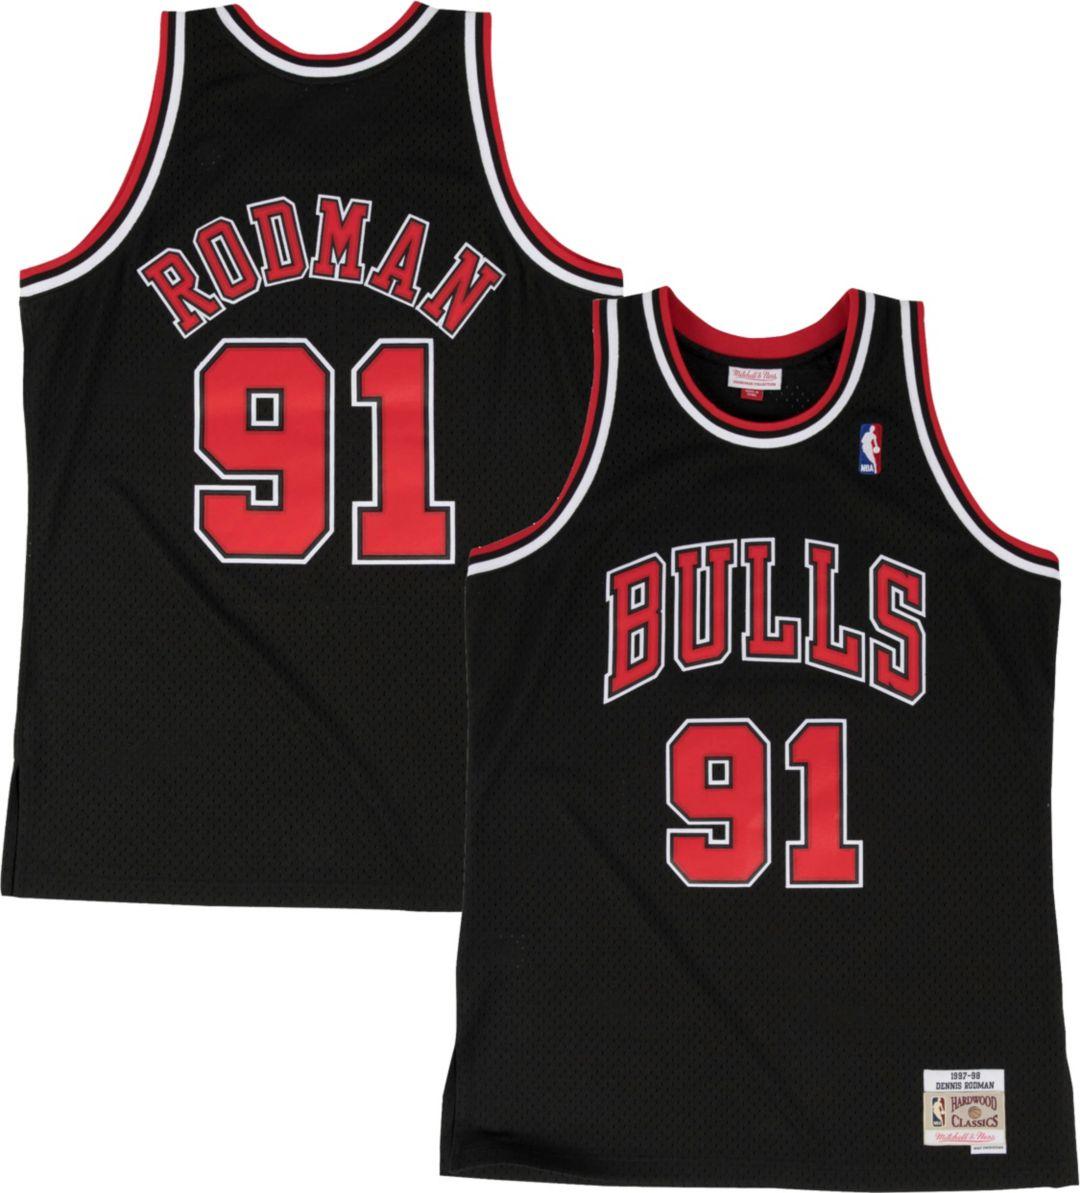 sale retailer e9ee8 0b92a Mitchell & Ness Men's Chicago Bulls Dennis Rodman #91 Hardwood Classics  Swingman Jersey